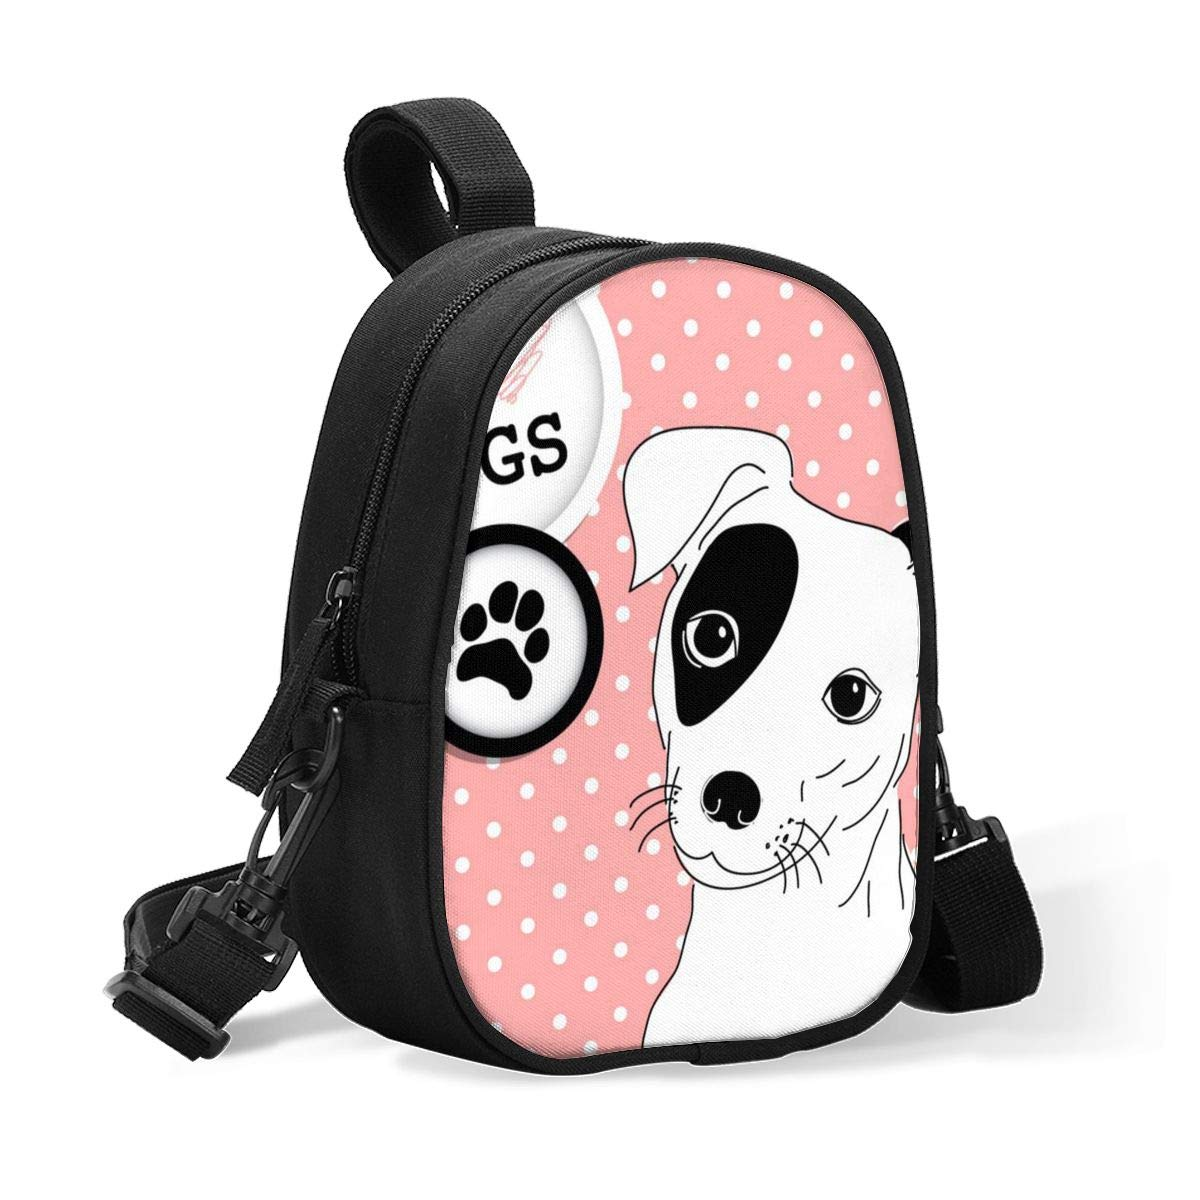 Breastmilk Cooler Bag Insulated Baby Bottle Bag Cute Funny Jack Russell Terrier I Love Dogs Reusable Baby Bottle Warmer Tote Bag Handbag Lunch Bag Box for 2 Large Bottles for Nursing Mom, Stroller